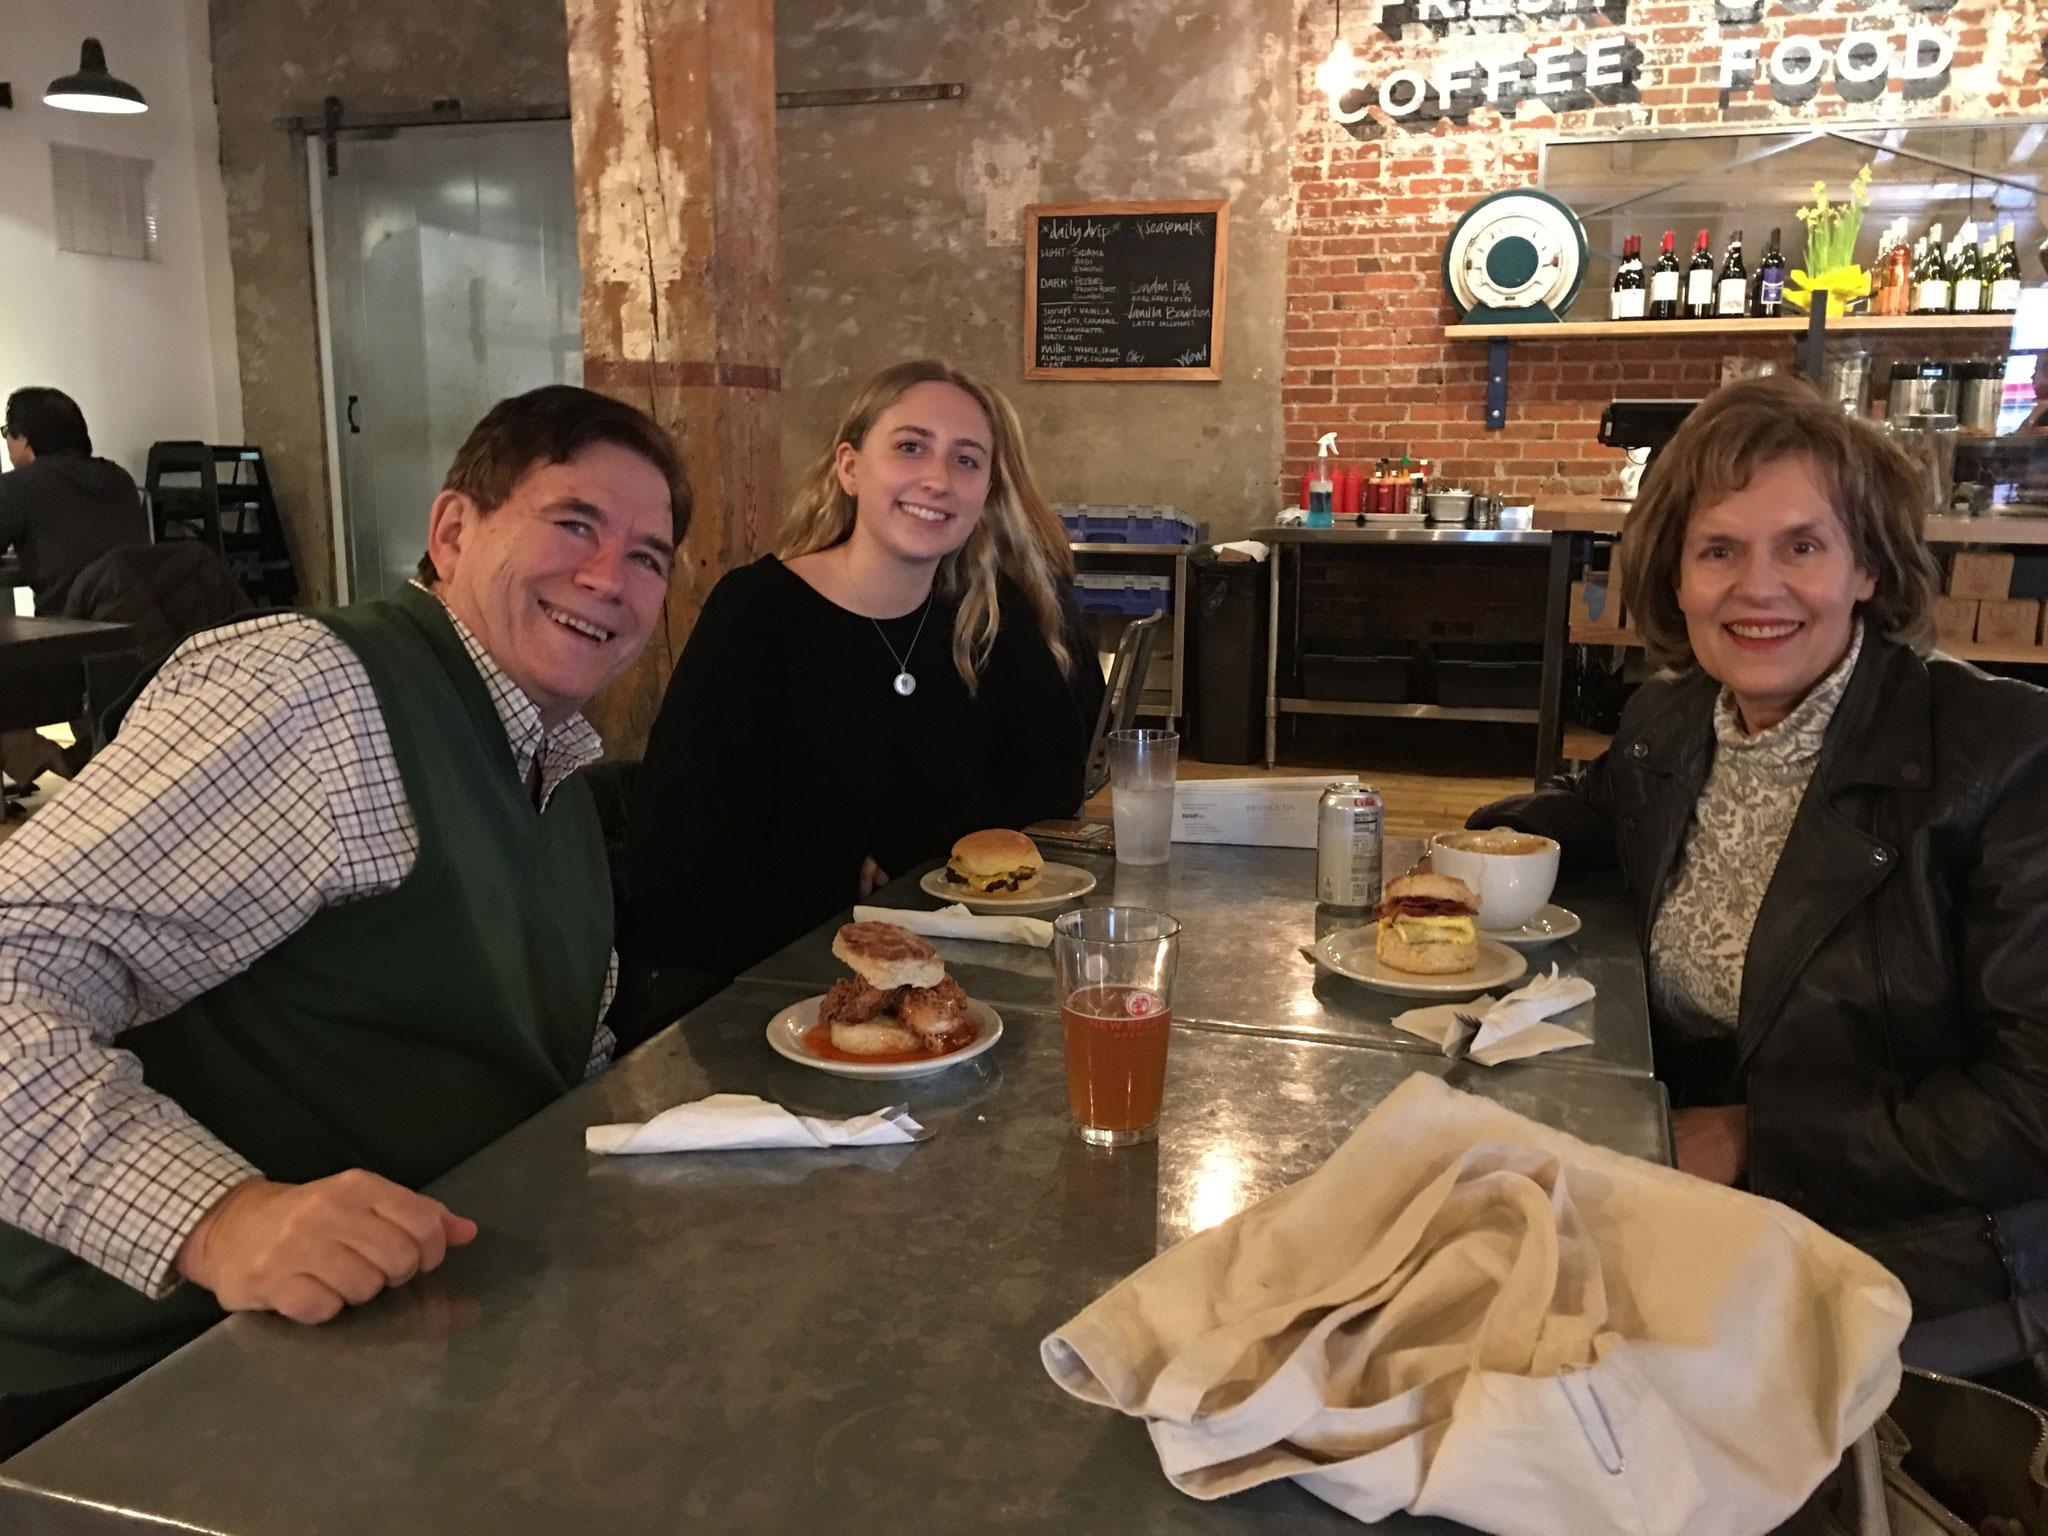 John, Emma, & Lorraine, Wake Forest Univ. Feb. 2019